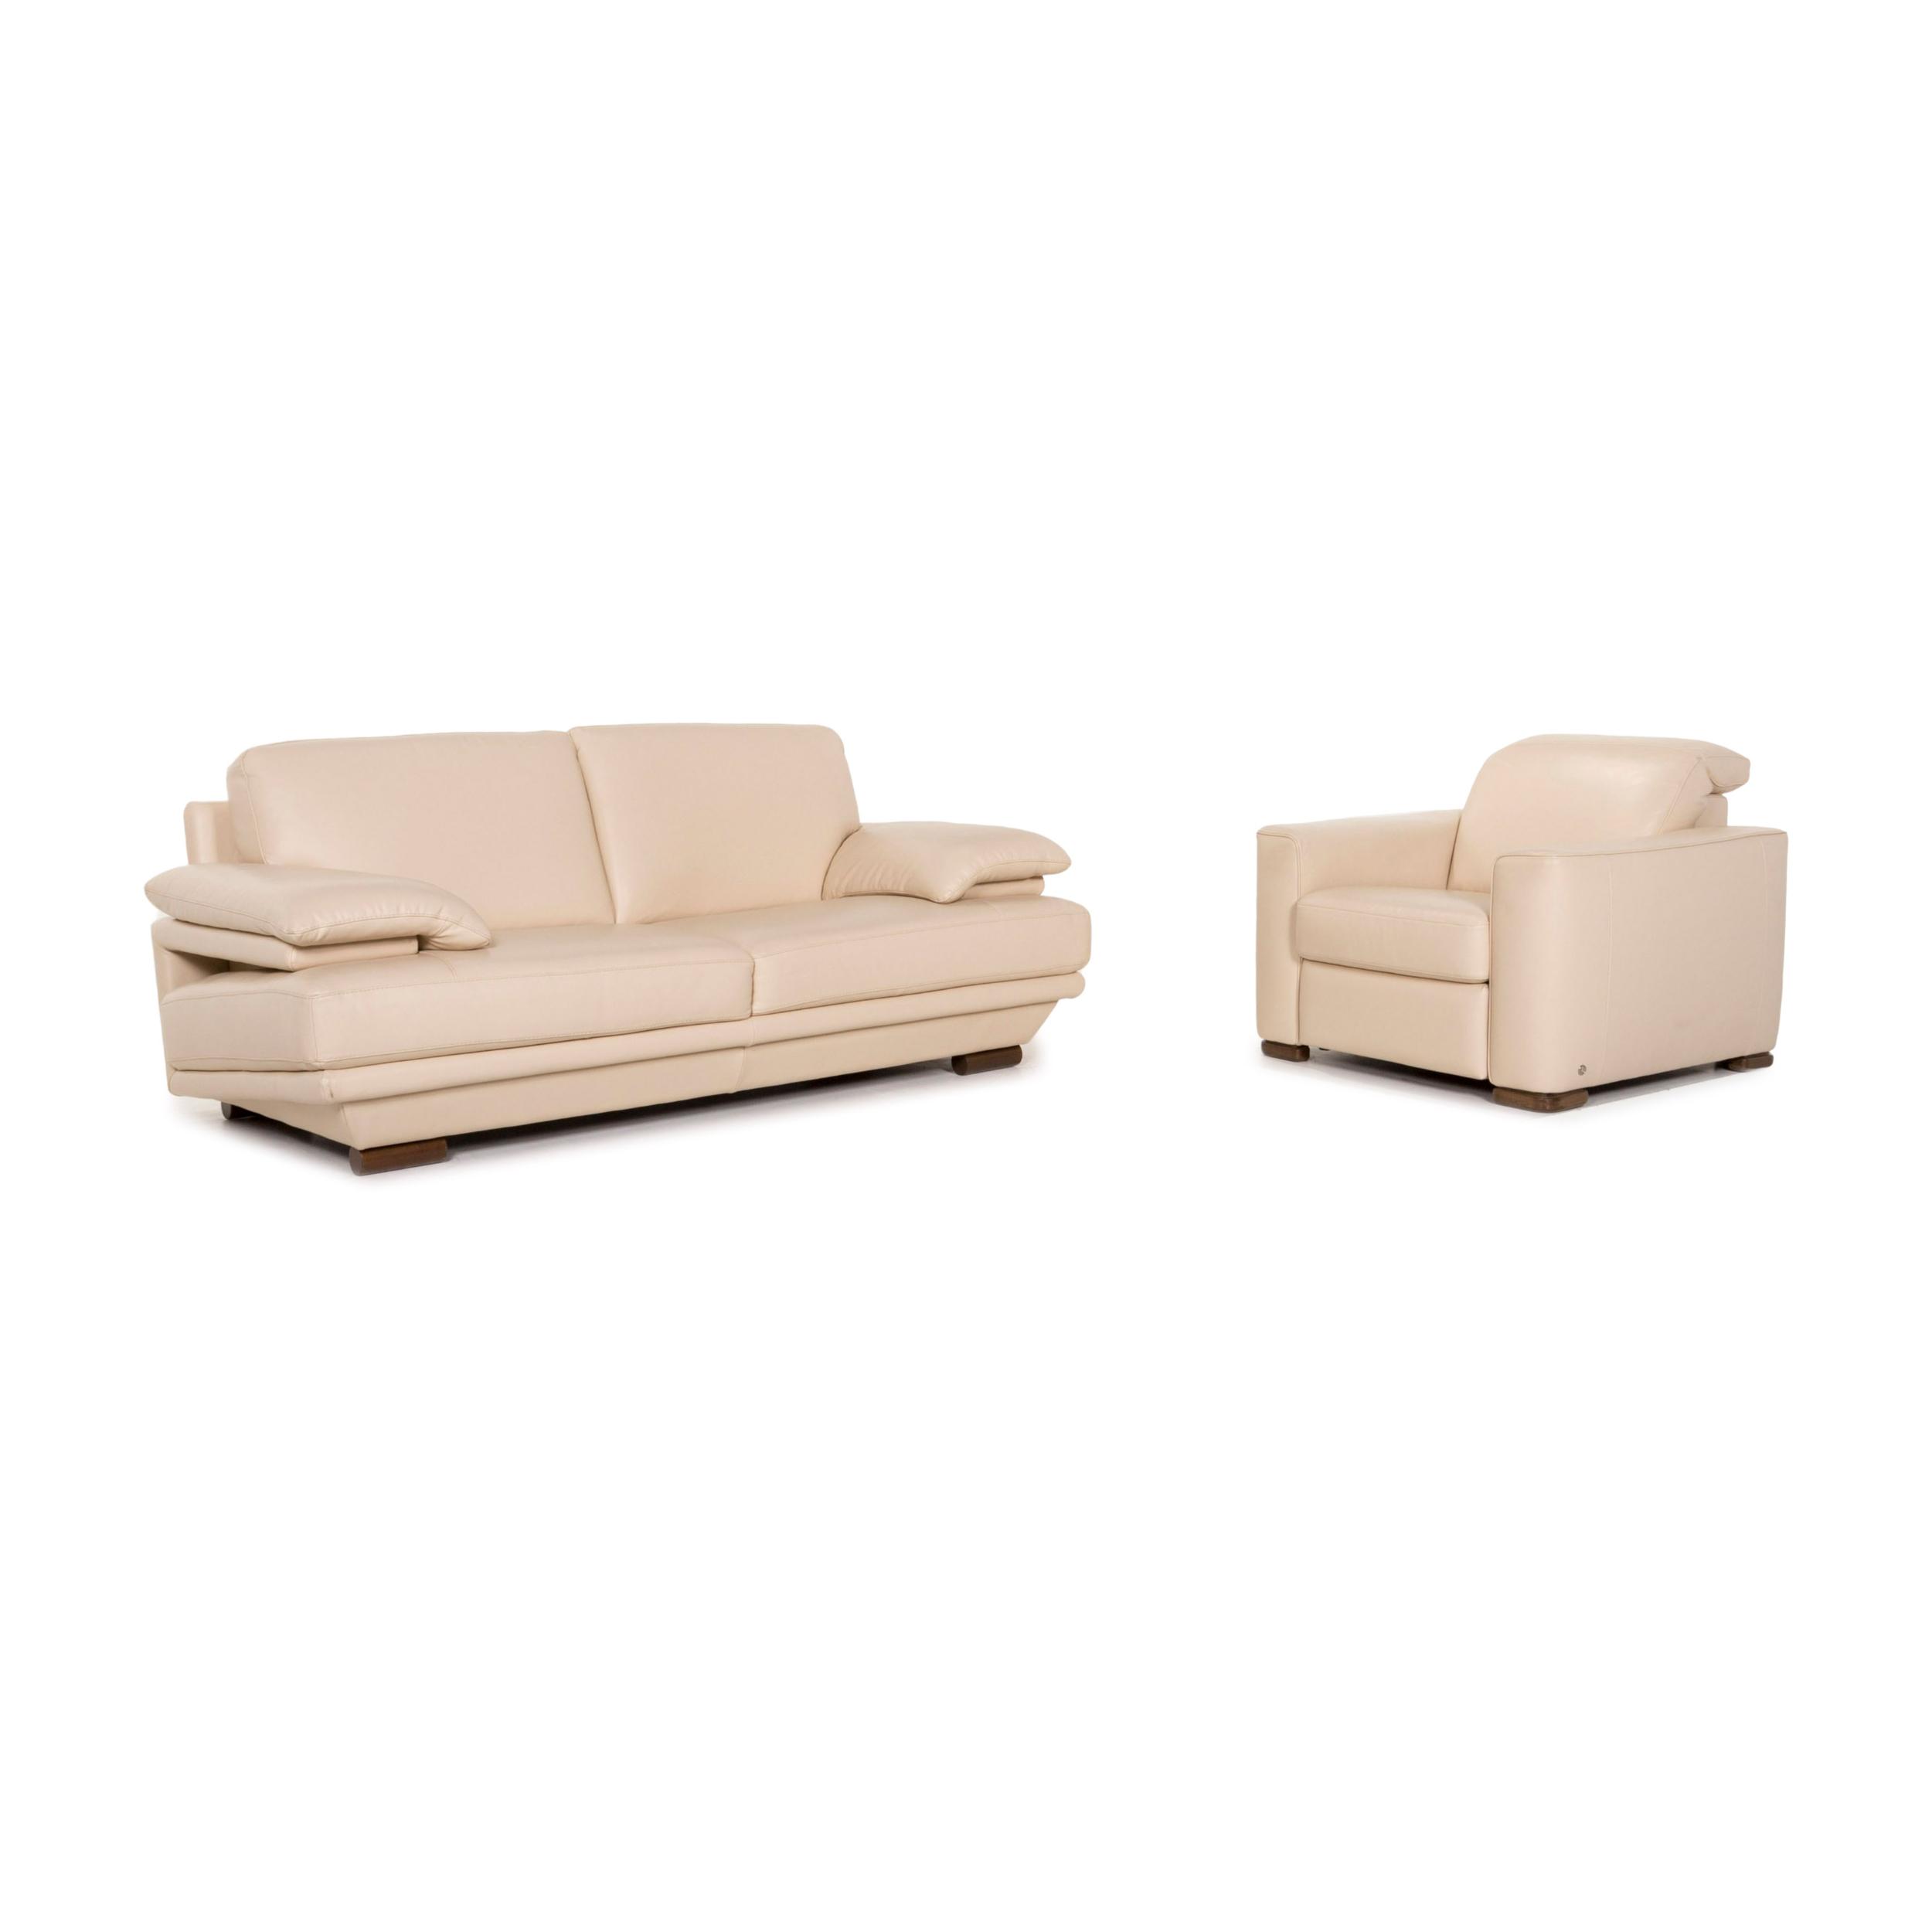 Picture of: Natuzzi Leather Sofa Set Cream 1x Two Seater 1x Armchair 12950 Natuzzi Vinterior